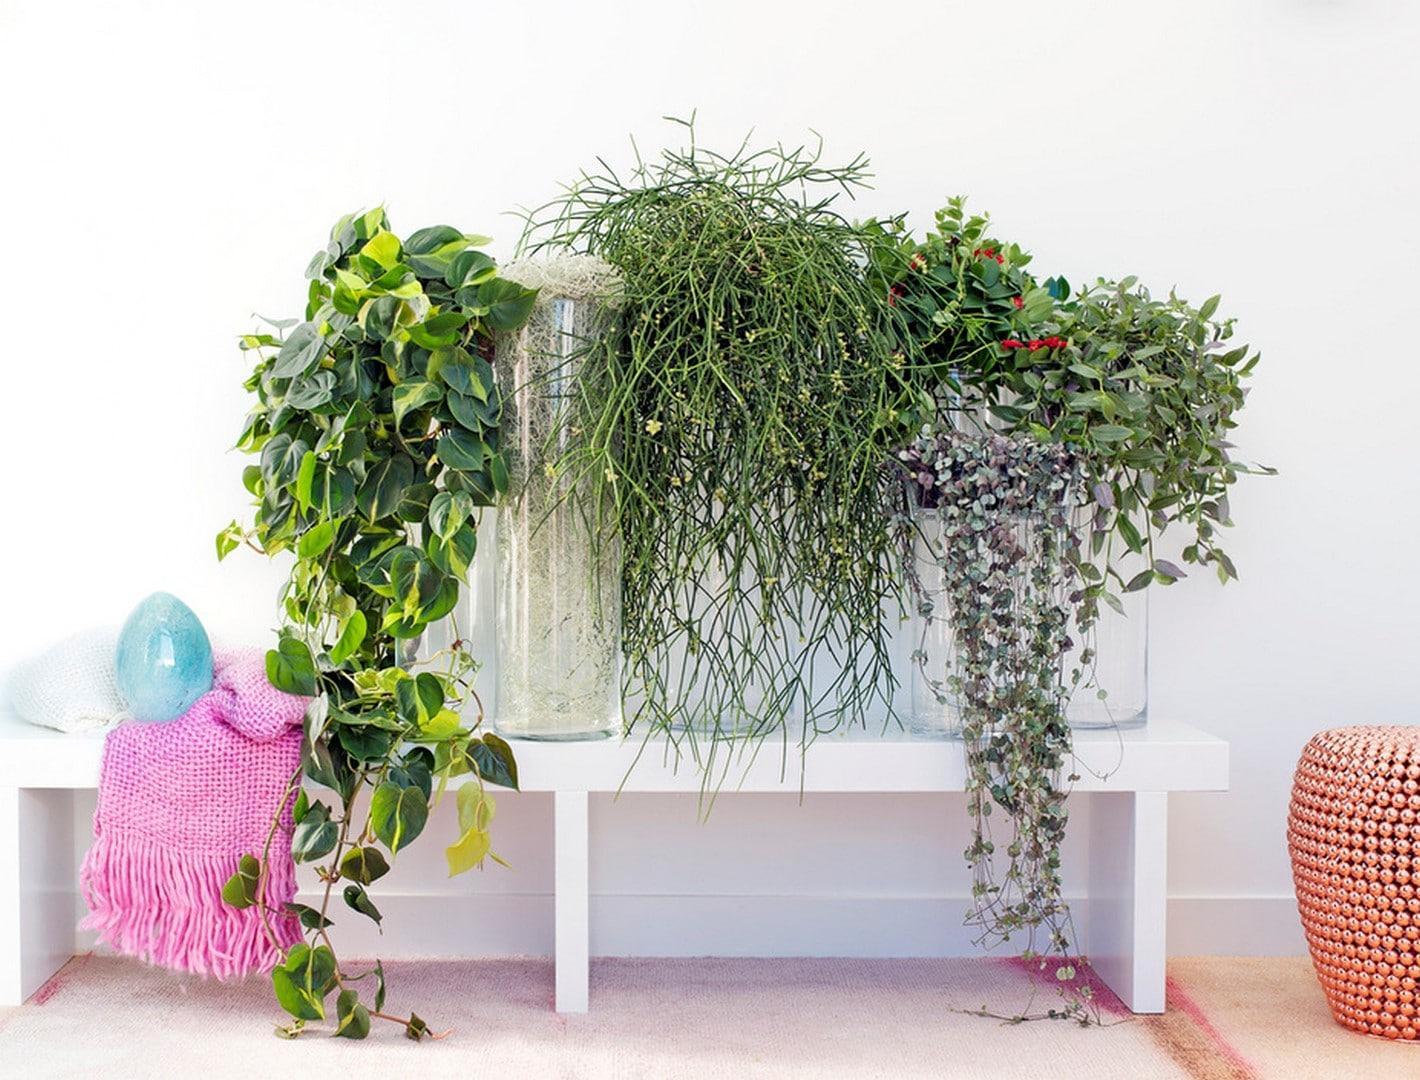 A Chaque Mois Sa Plante, septembre 2016 : les Plantes retombantes